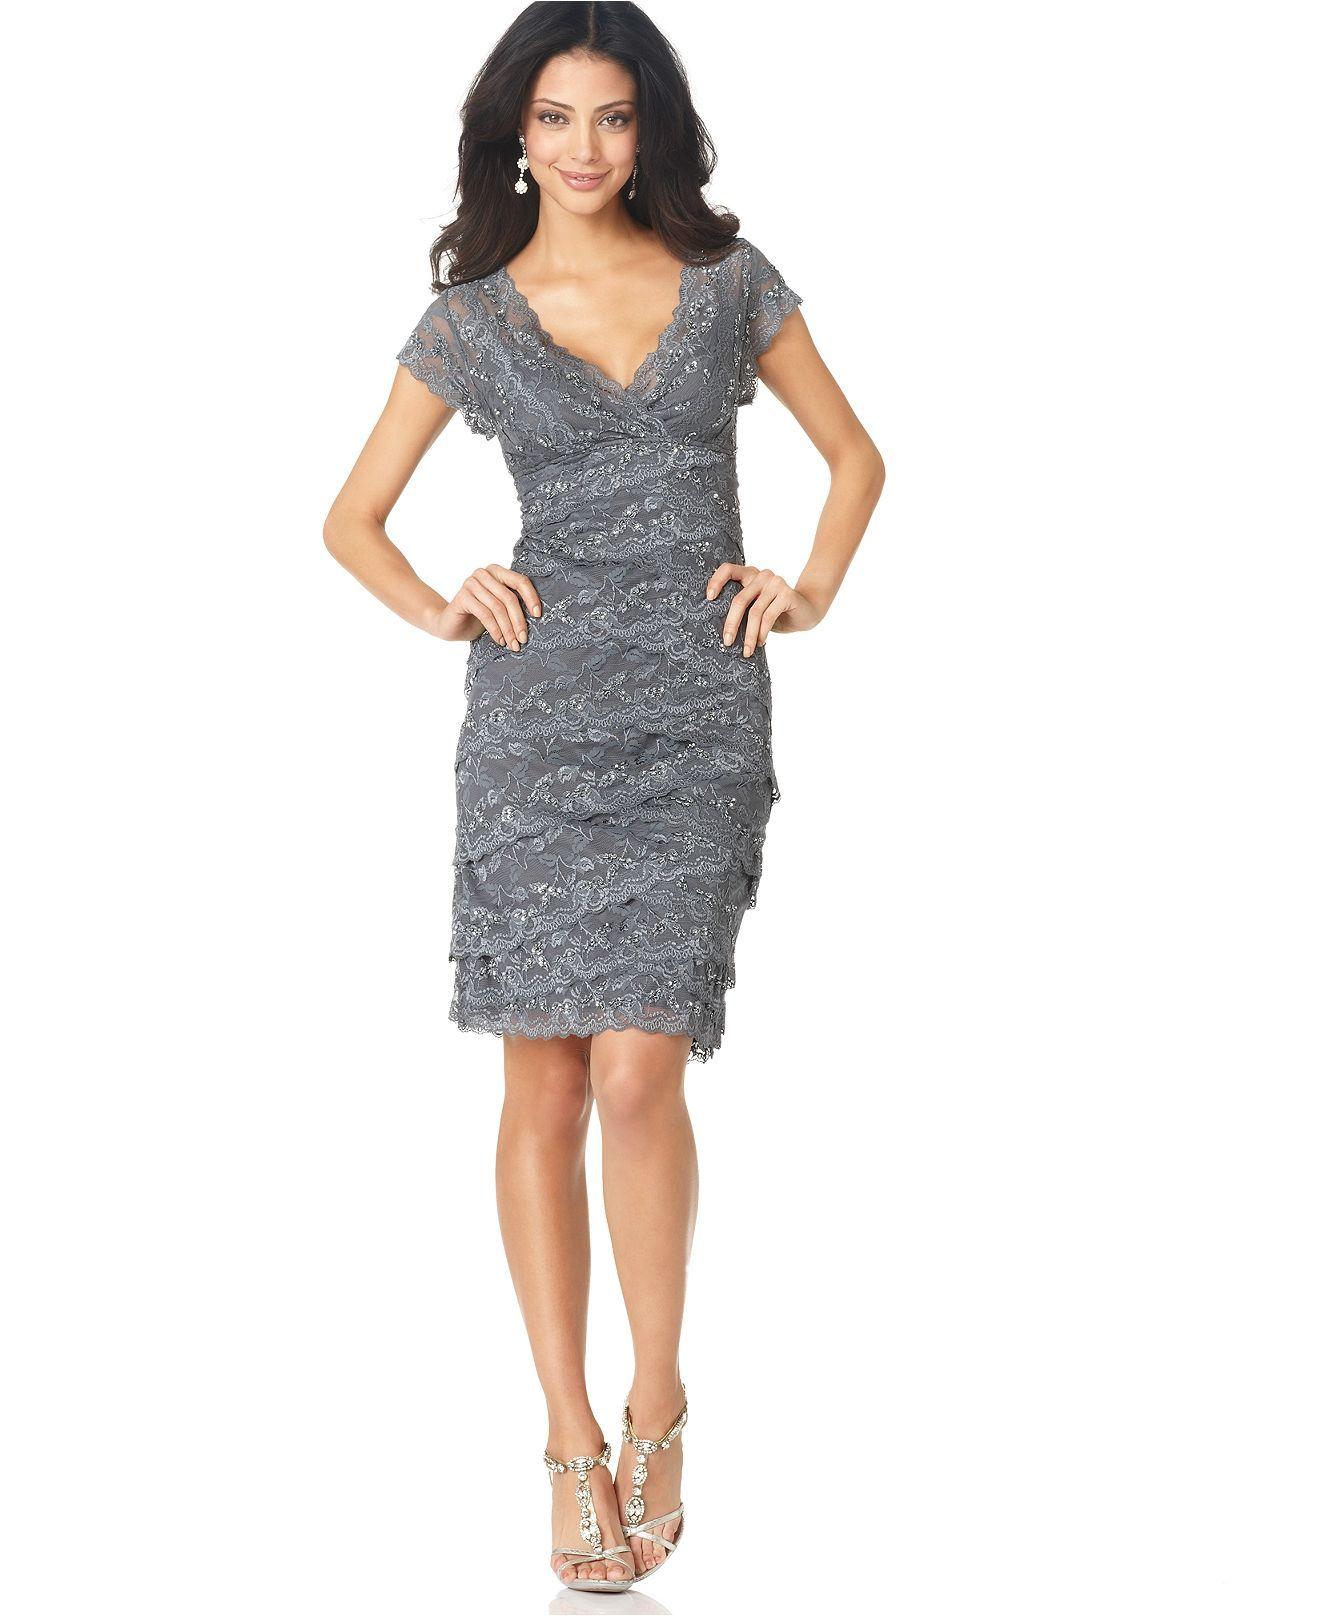 Lace dress macys  Marina Dress Cap Sleeve Lace Cocktail Dress  Womens Dresses